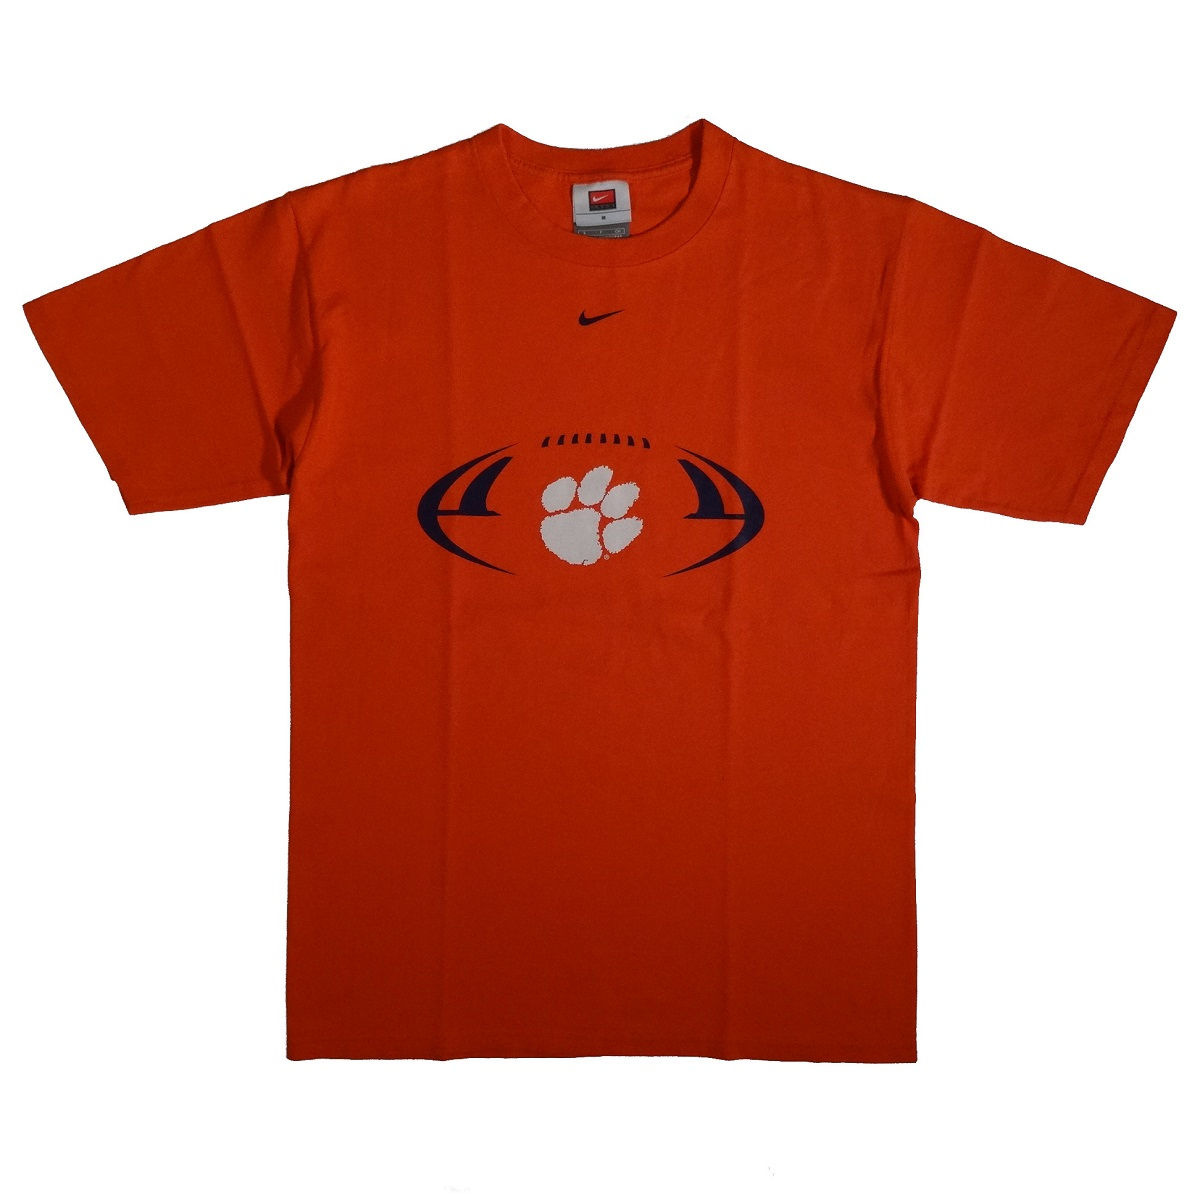 Clemson Tigers Football Nike T Shirt Front